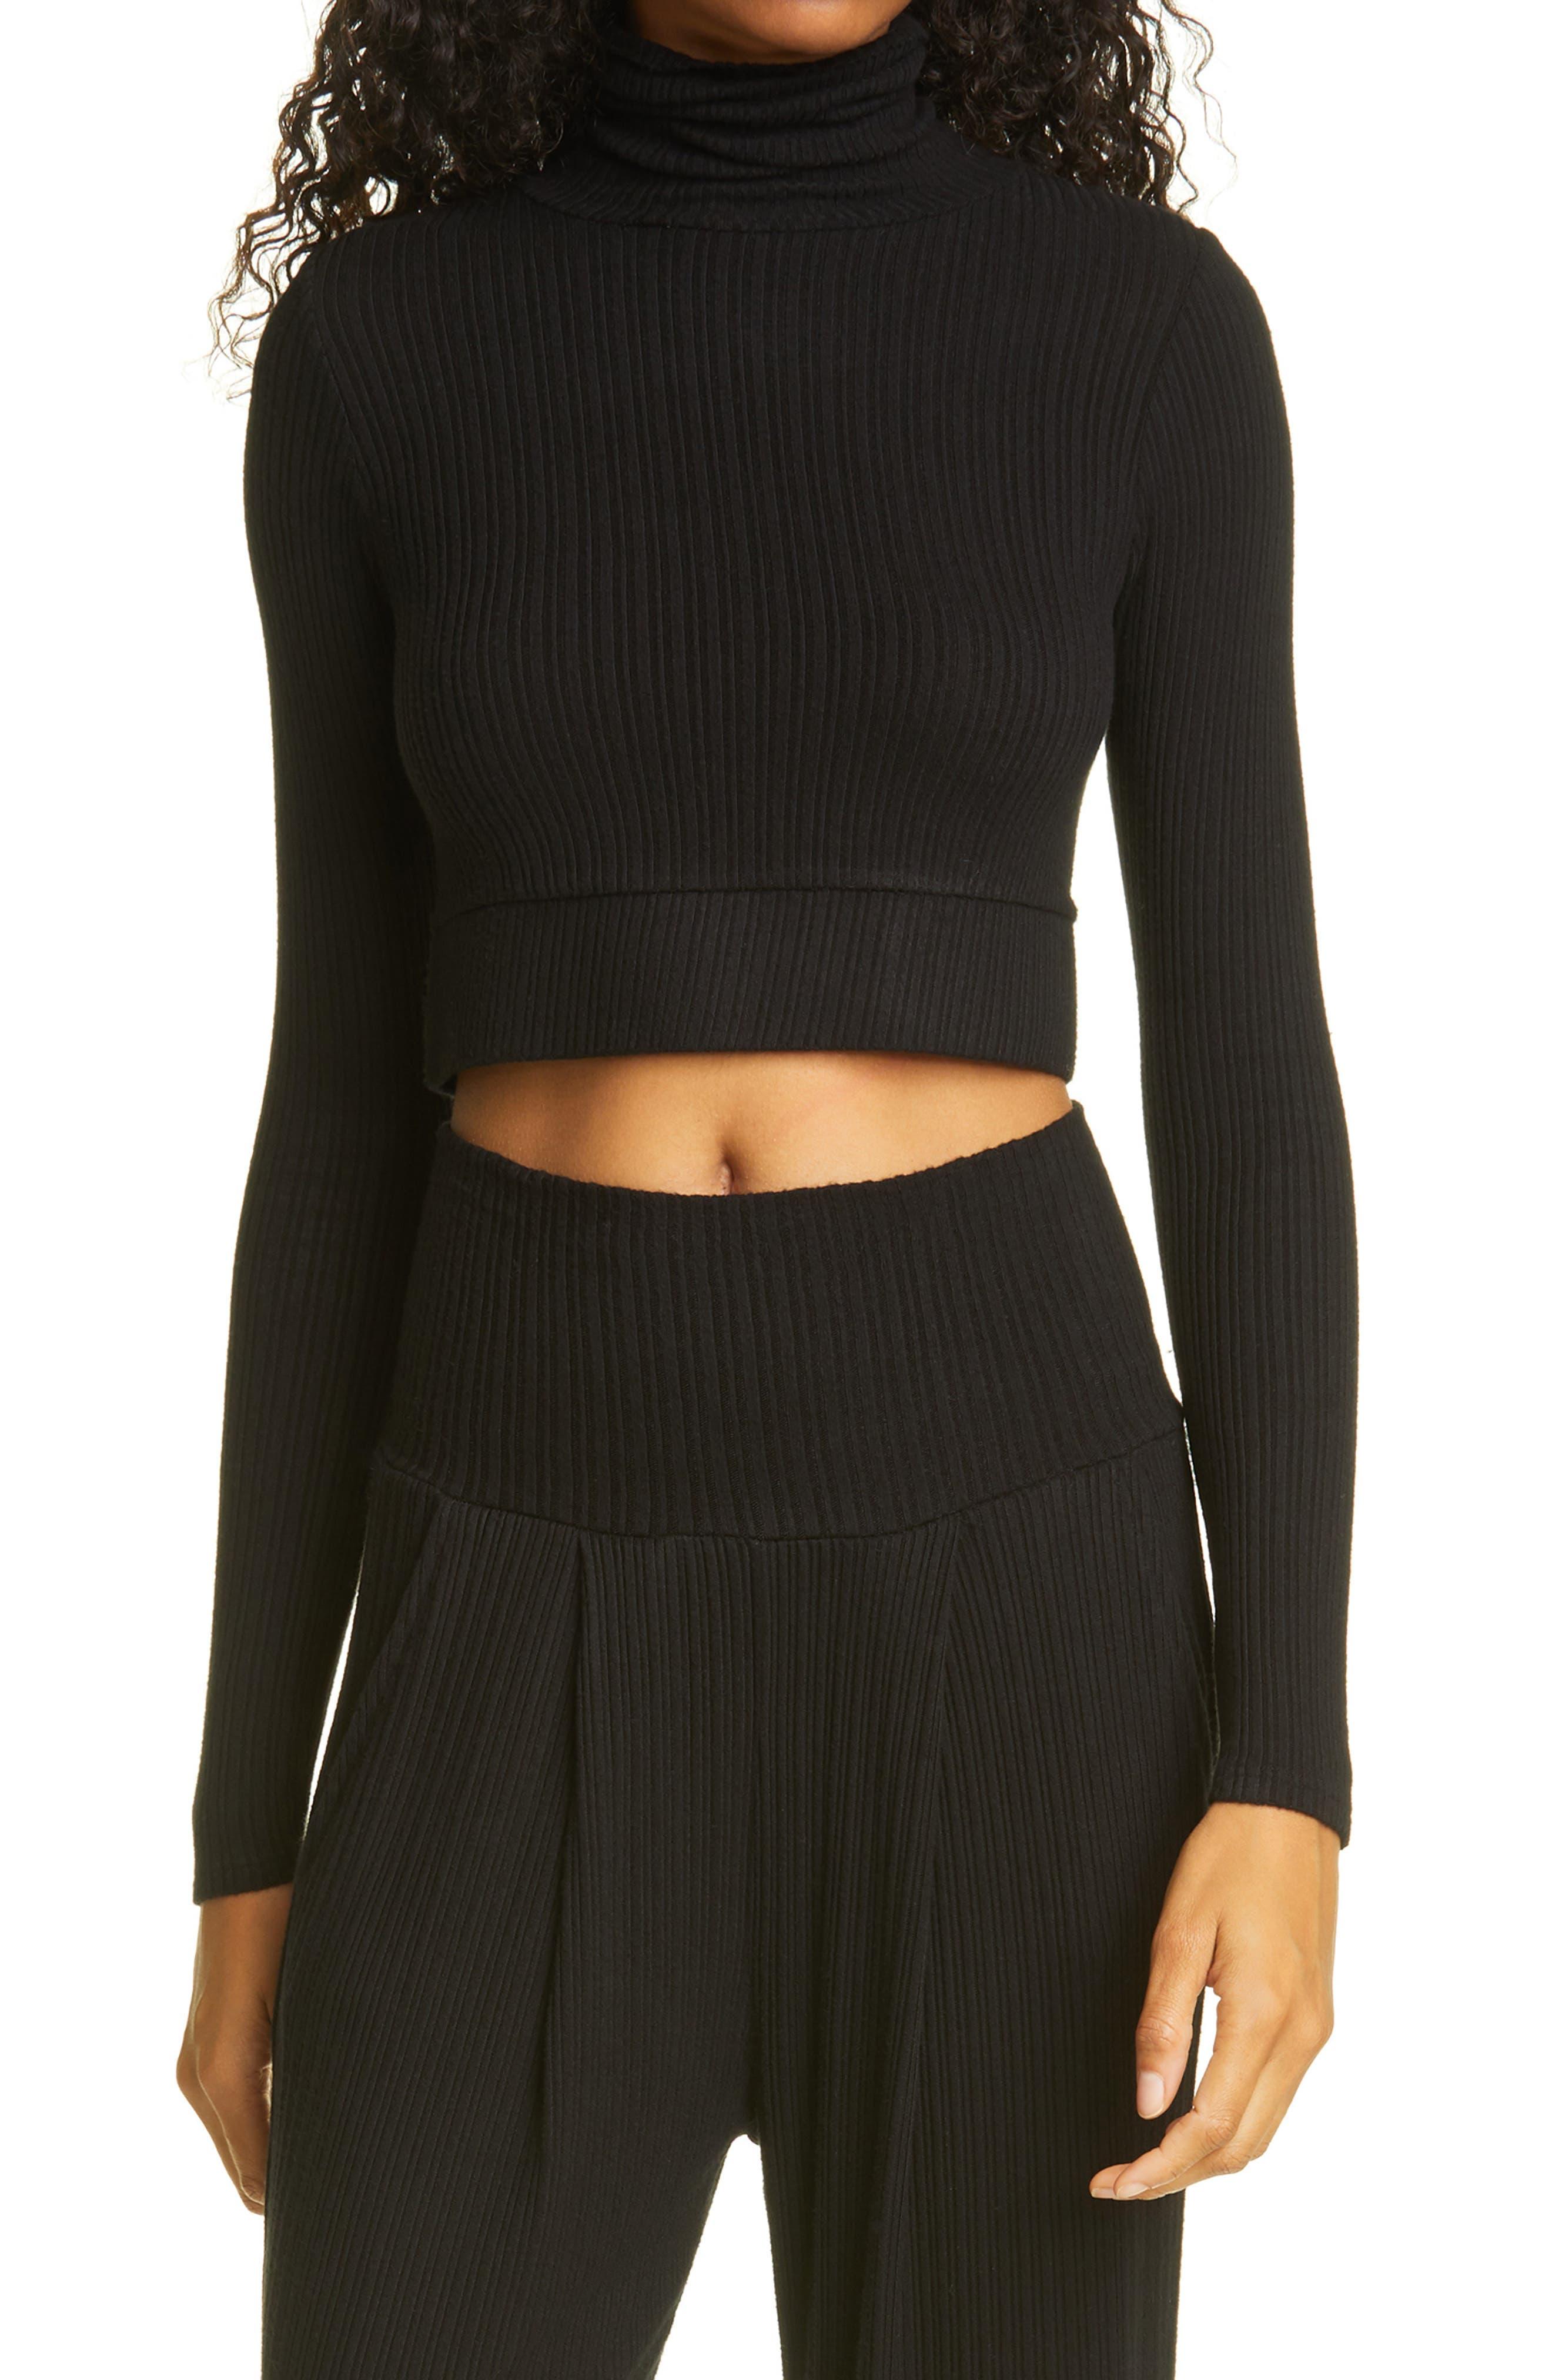 NSF Clothing Women's Nsf Clothing Bridget Crop Turtleneck Top, Size Small - Black